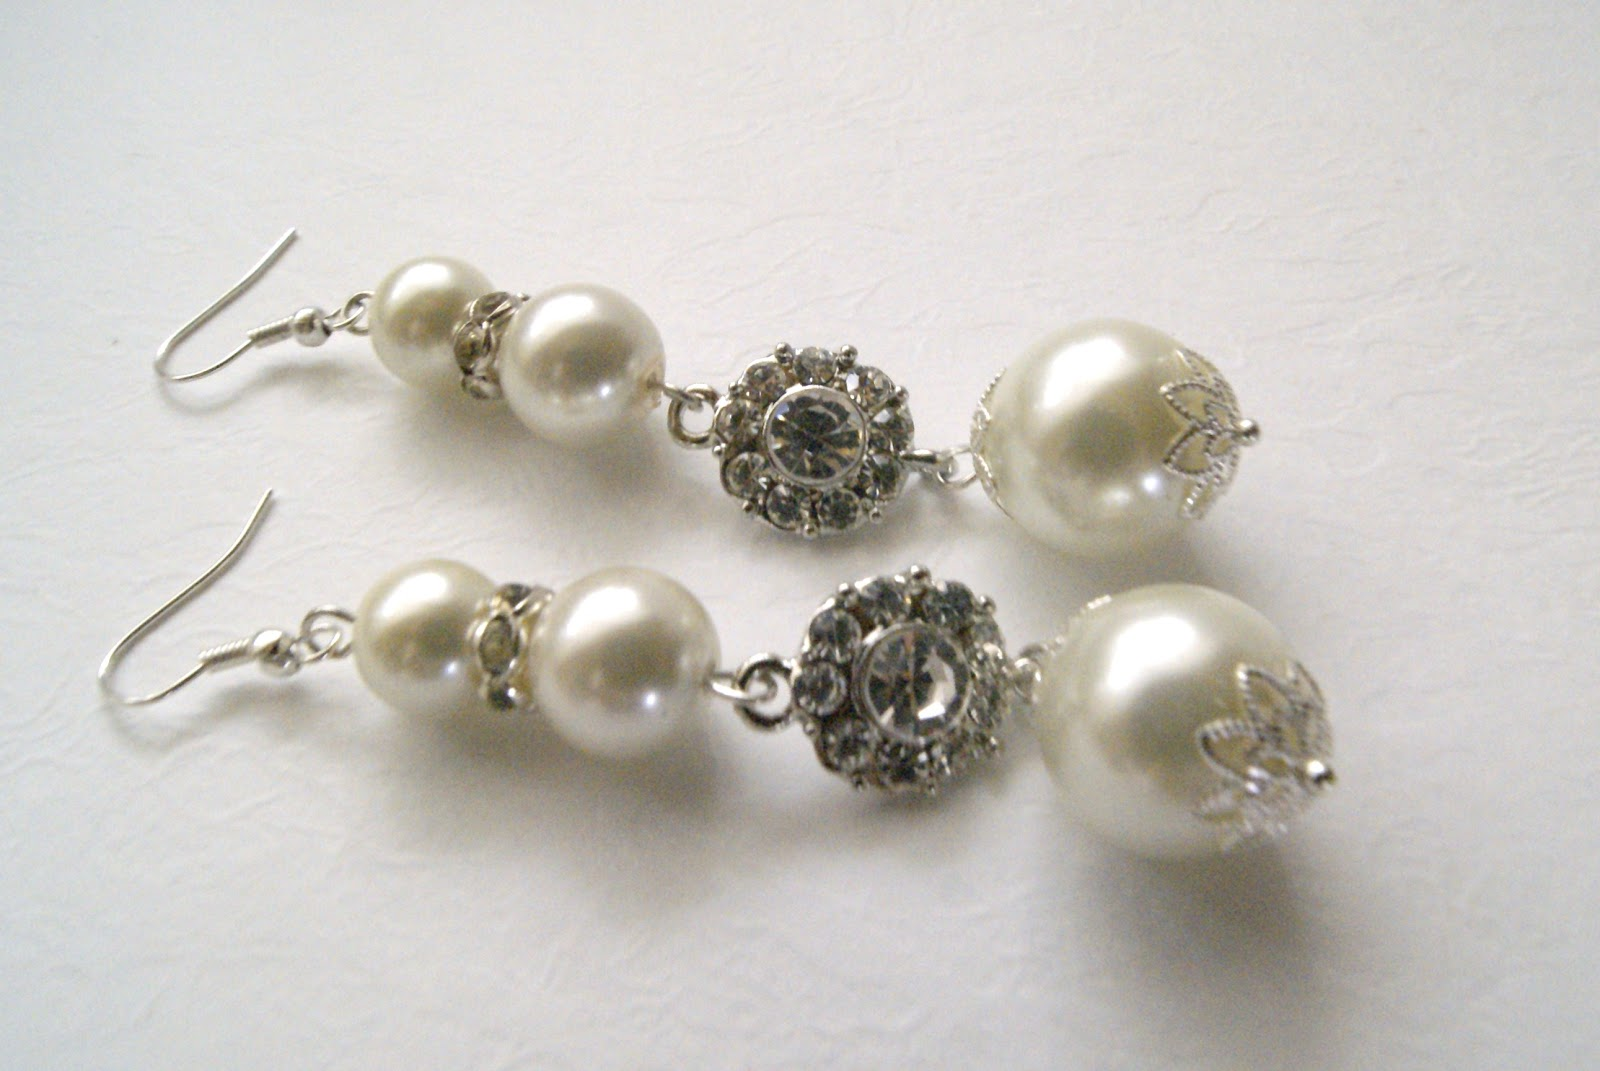 Vintage Chandelier Crystals